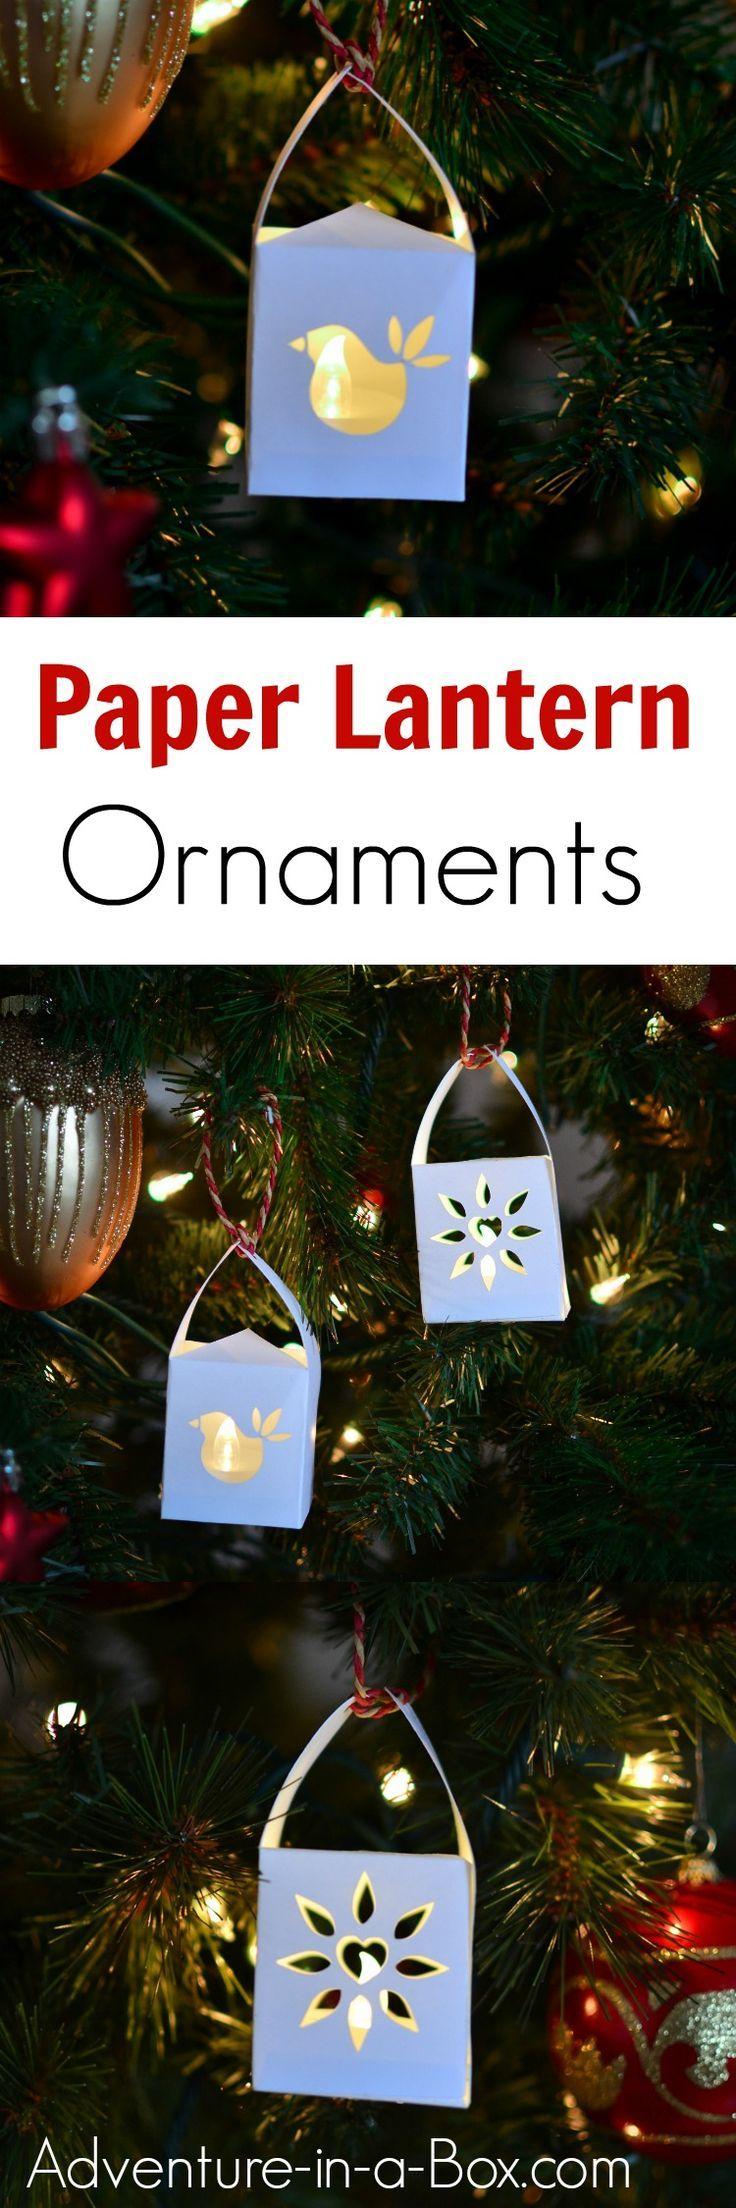 Paper Lantern Christmas Ornaments Christmas Ornaments Christmas Crafts Kids Christmas Ornaments